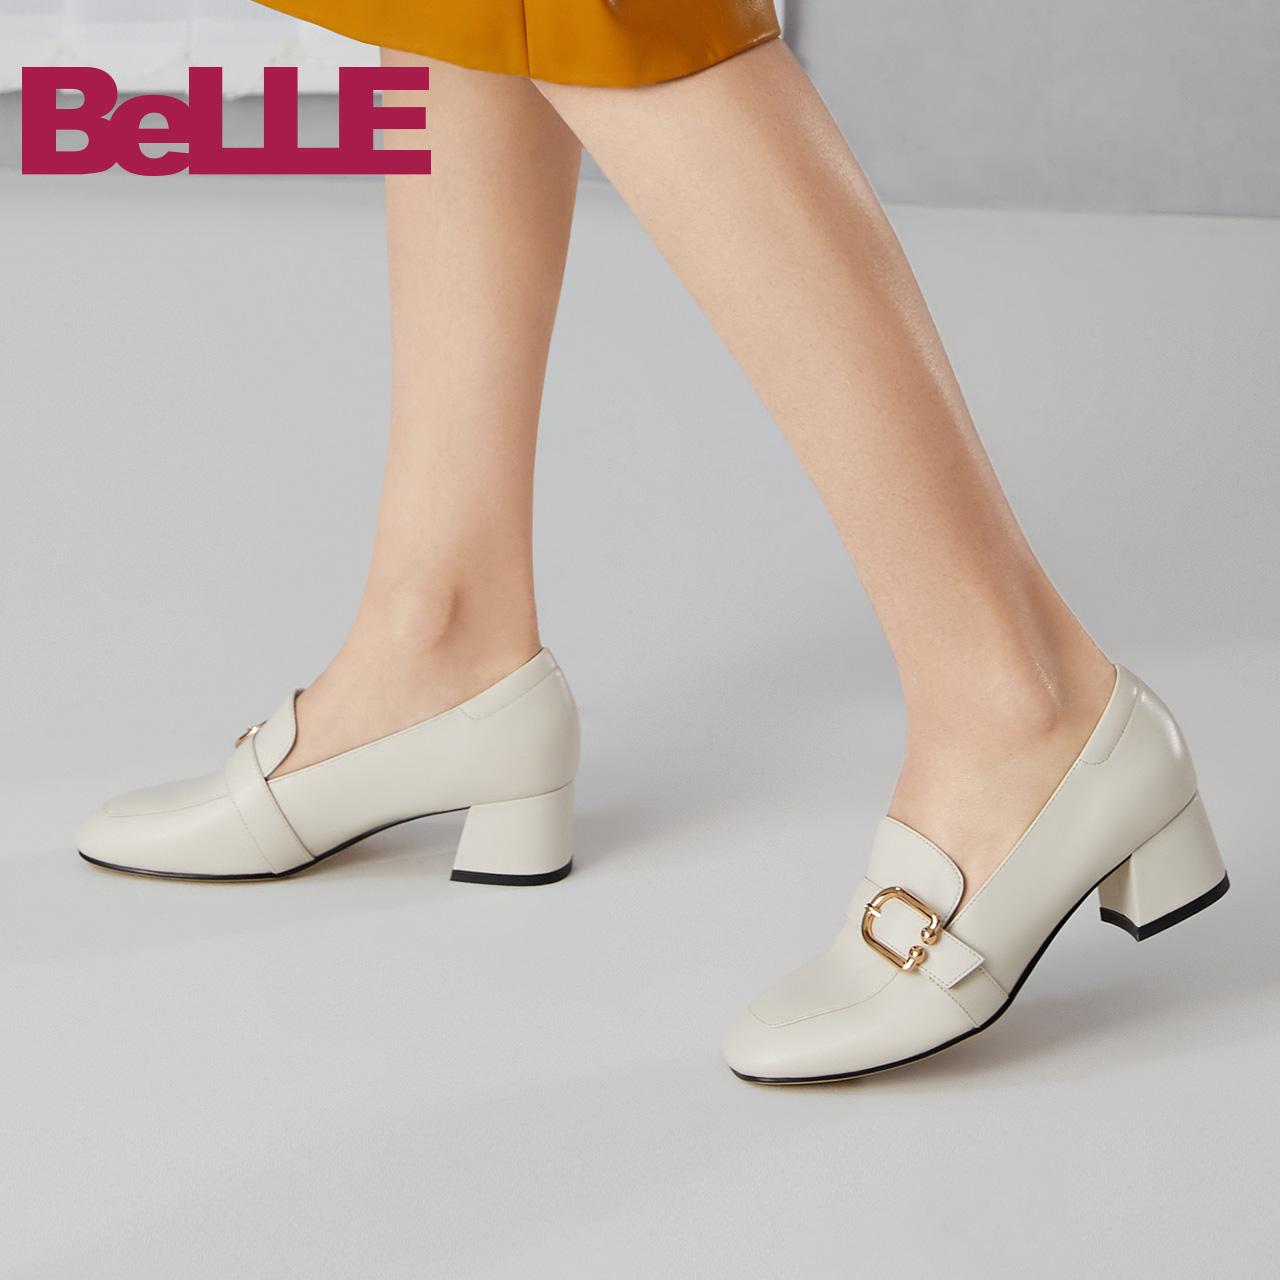 BZ9A1CM9 秋新牛皮革粗跟单鞋 2019 百丽英伦风乐福鞋女